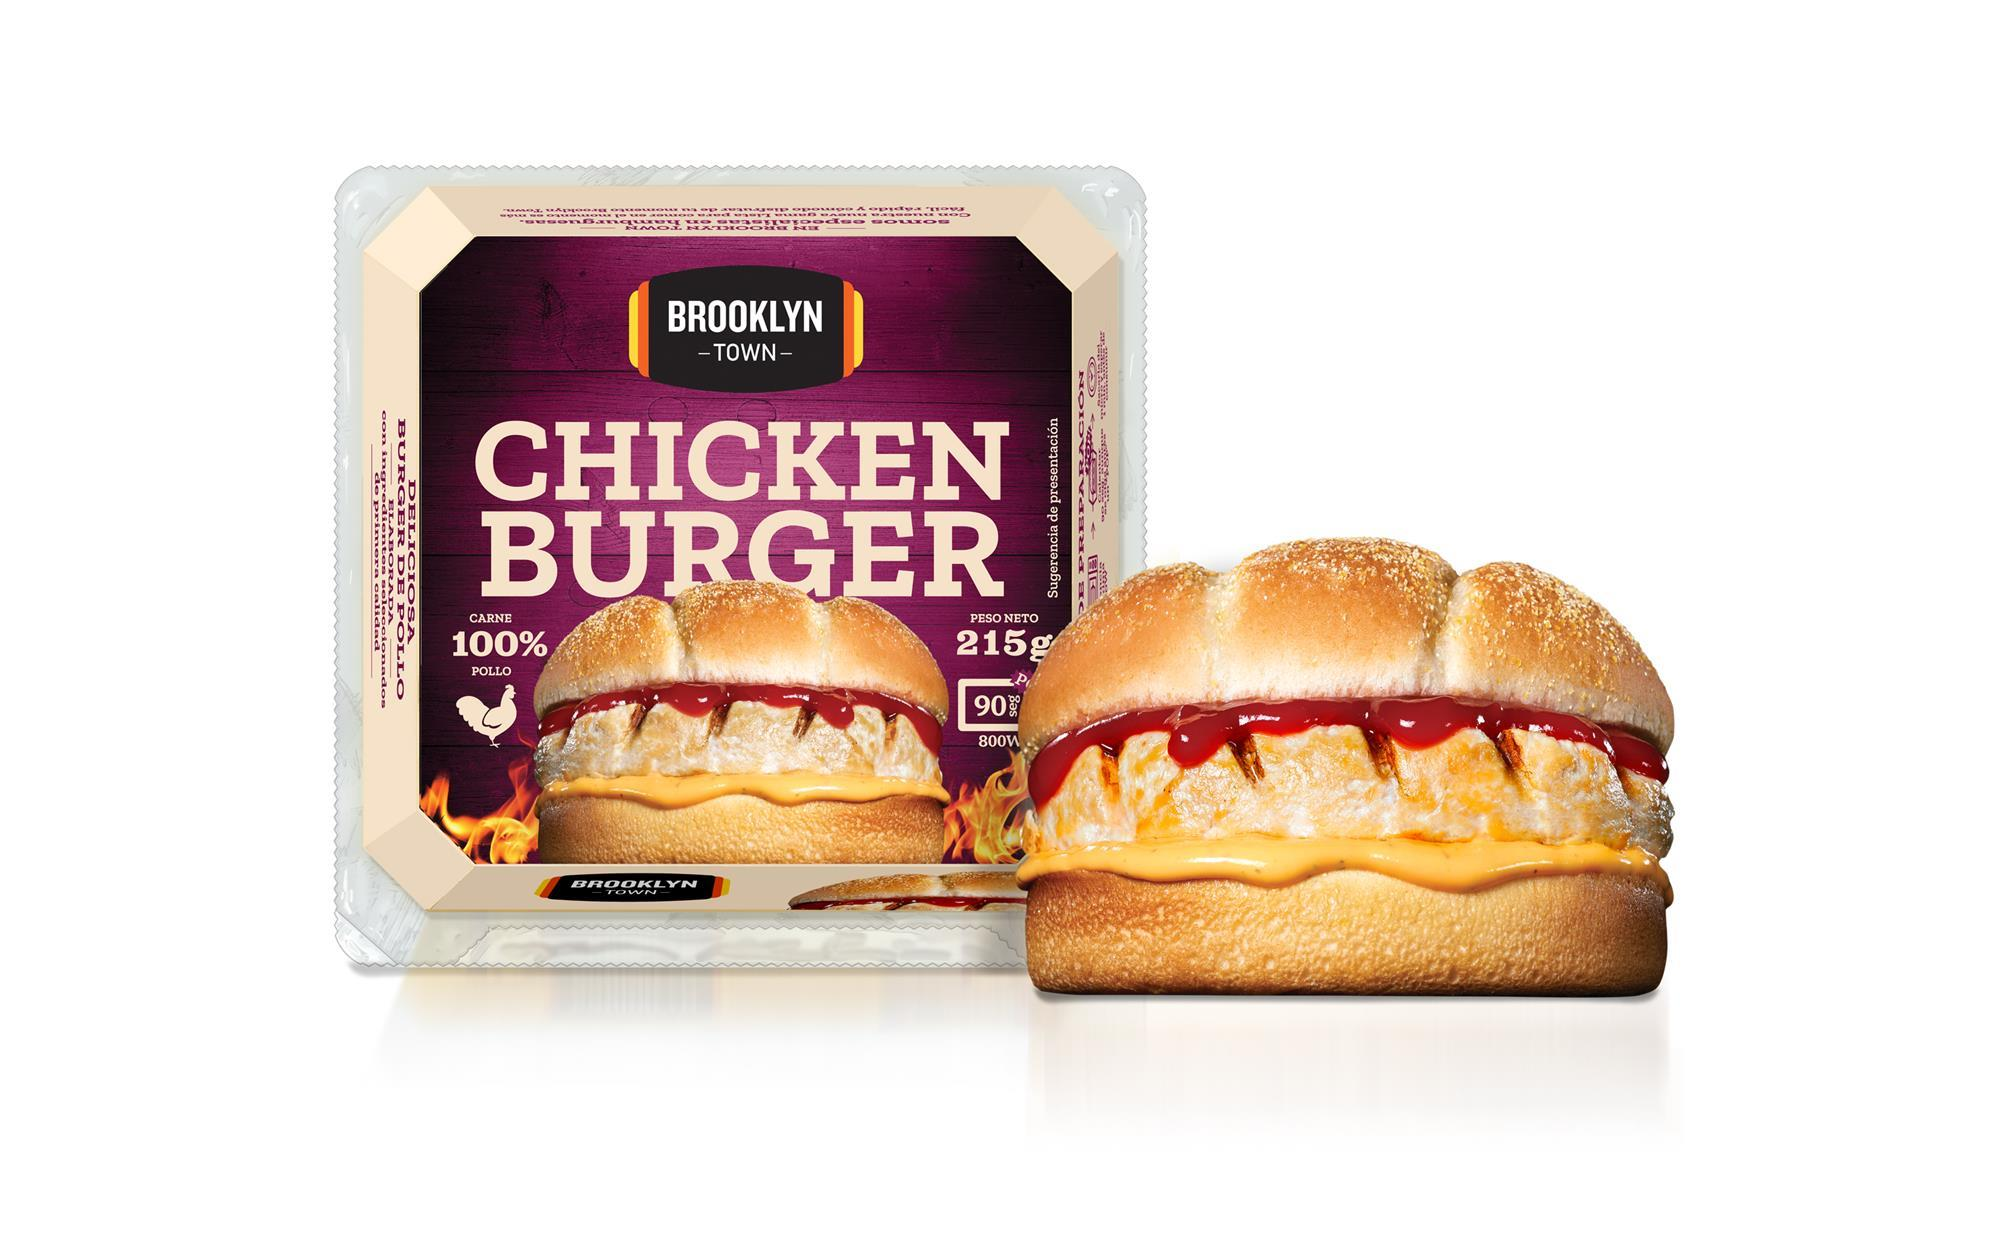 Chicken Burger los mejores restaurantes donde pedir comida en casa - chicken burger e30ce0d2 2000x1234